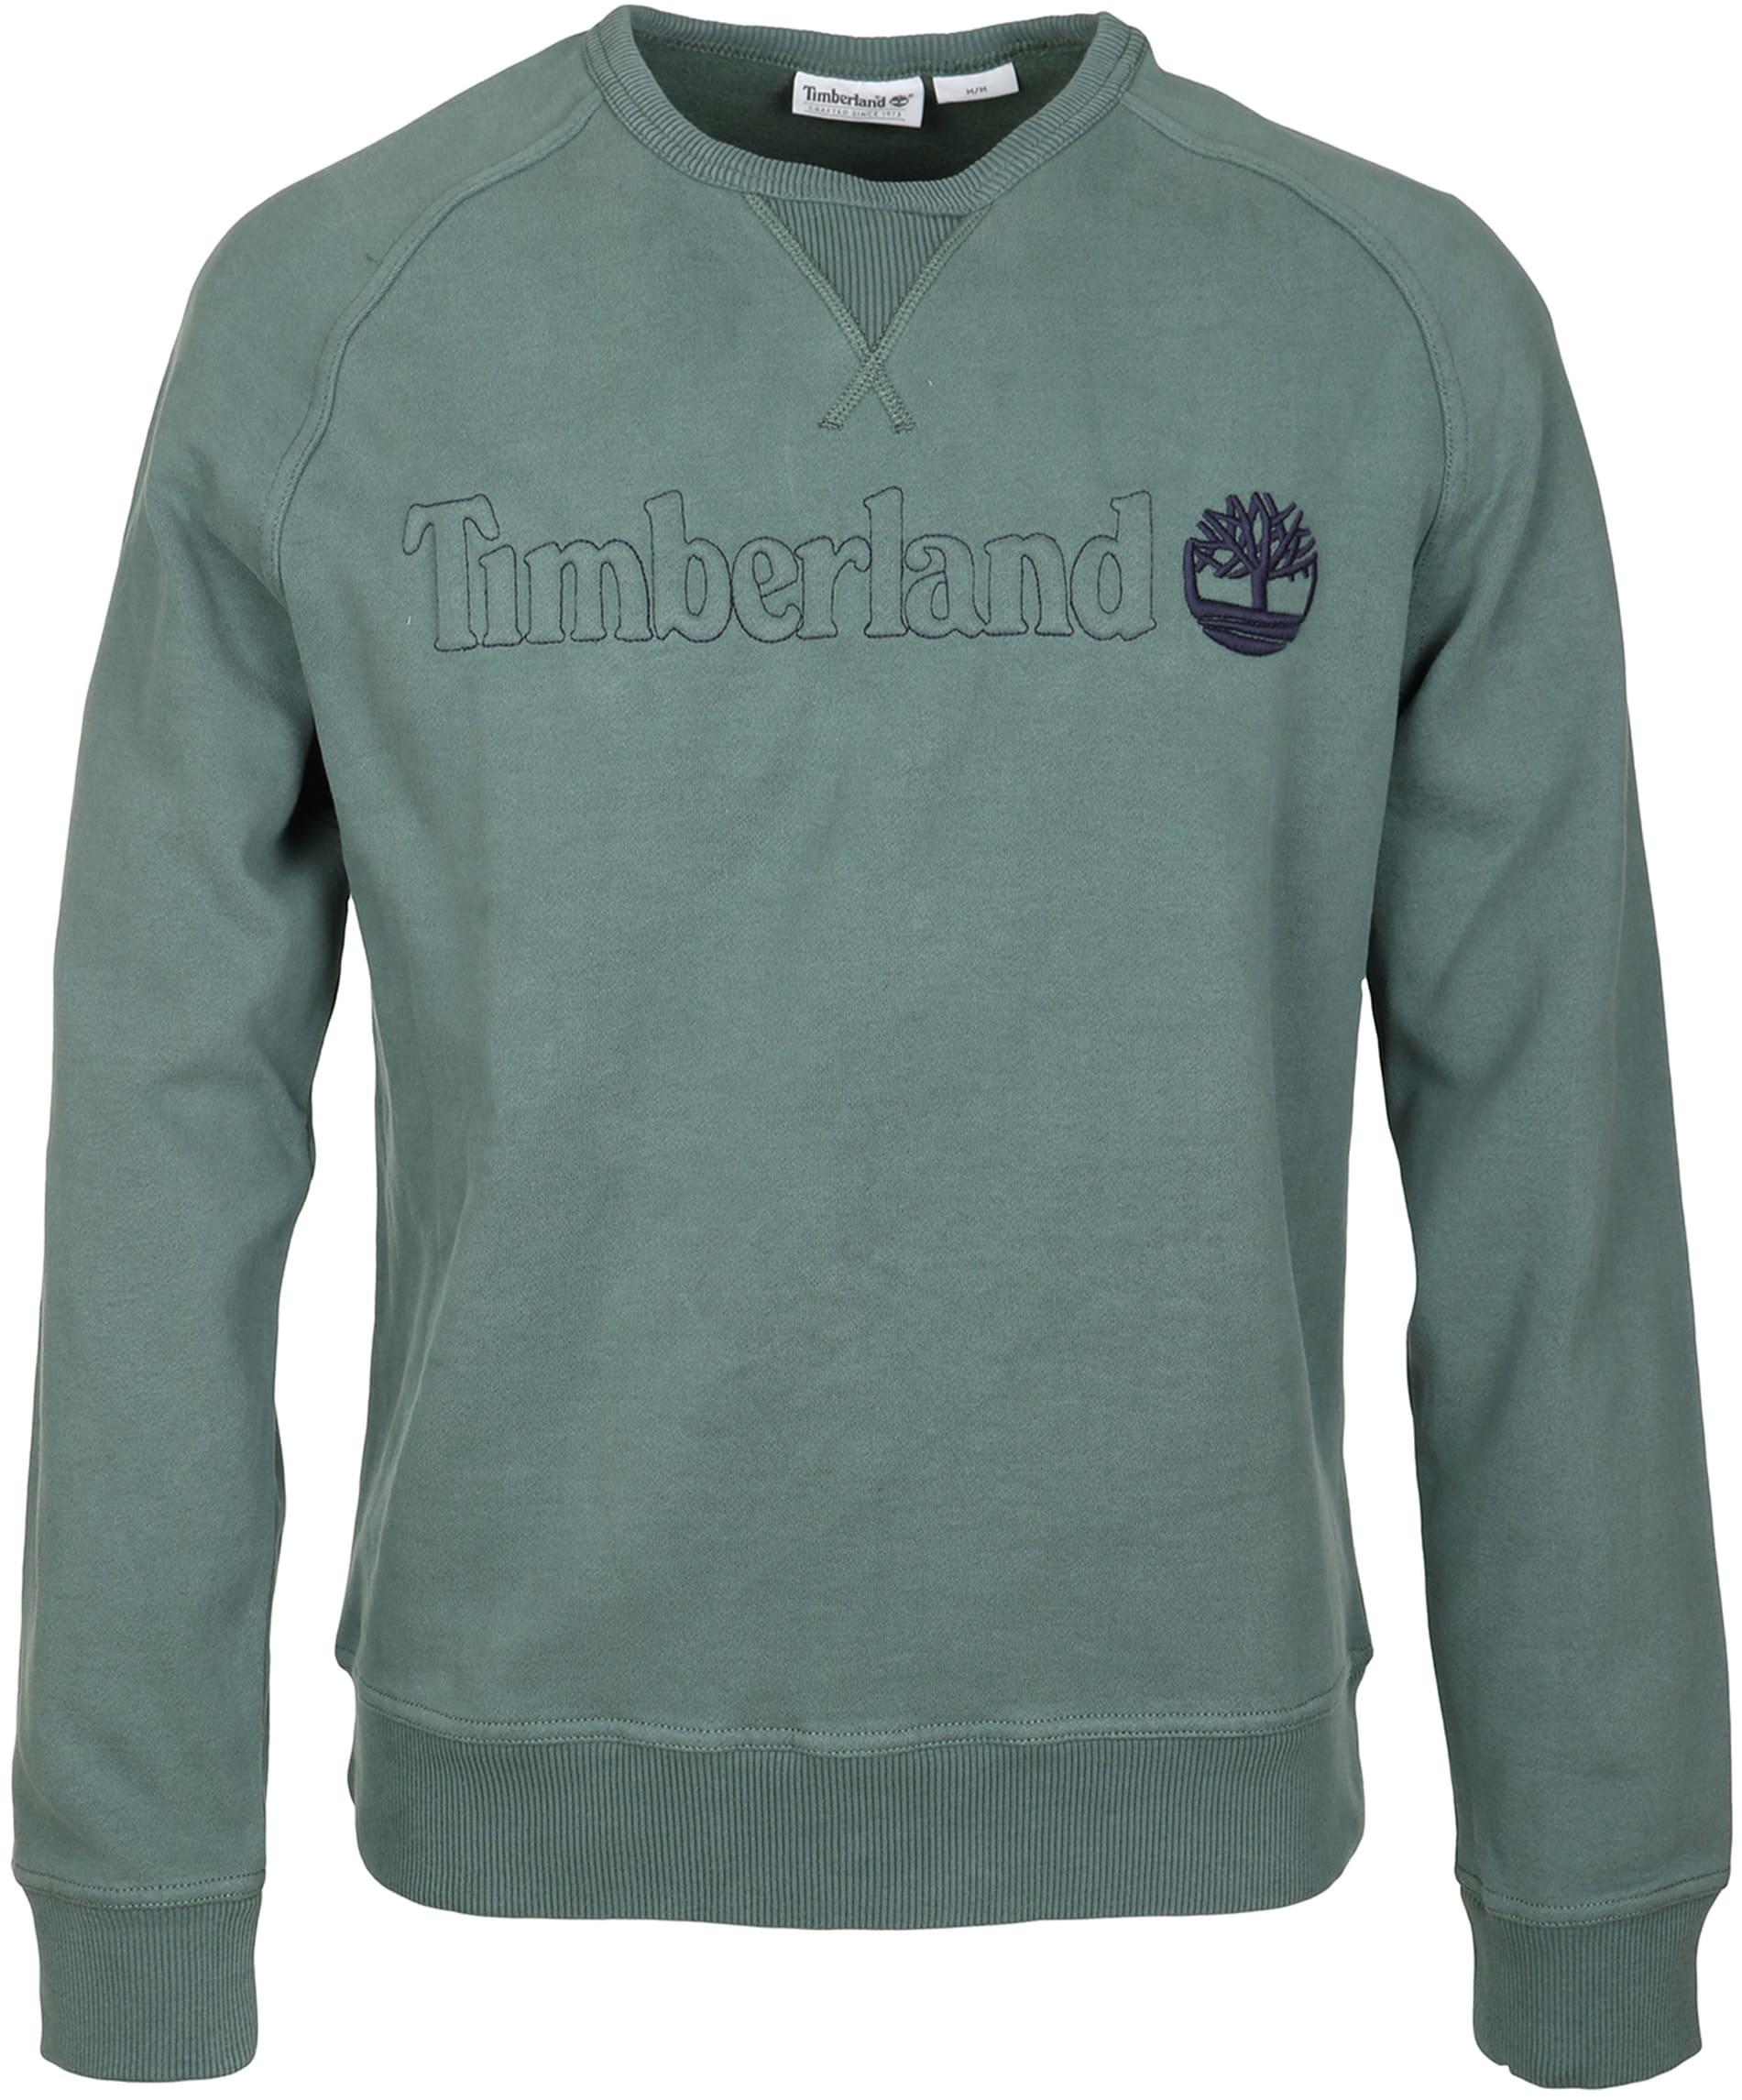 Timberland Sweater Groen Raglan foto 0